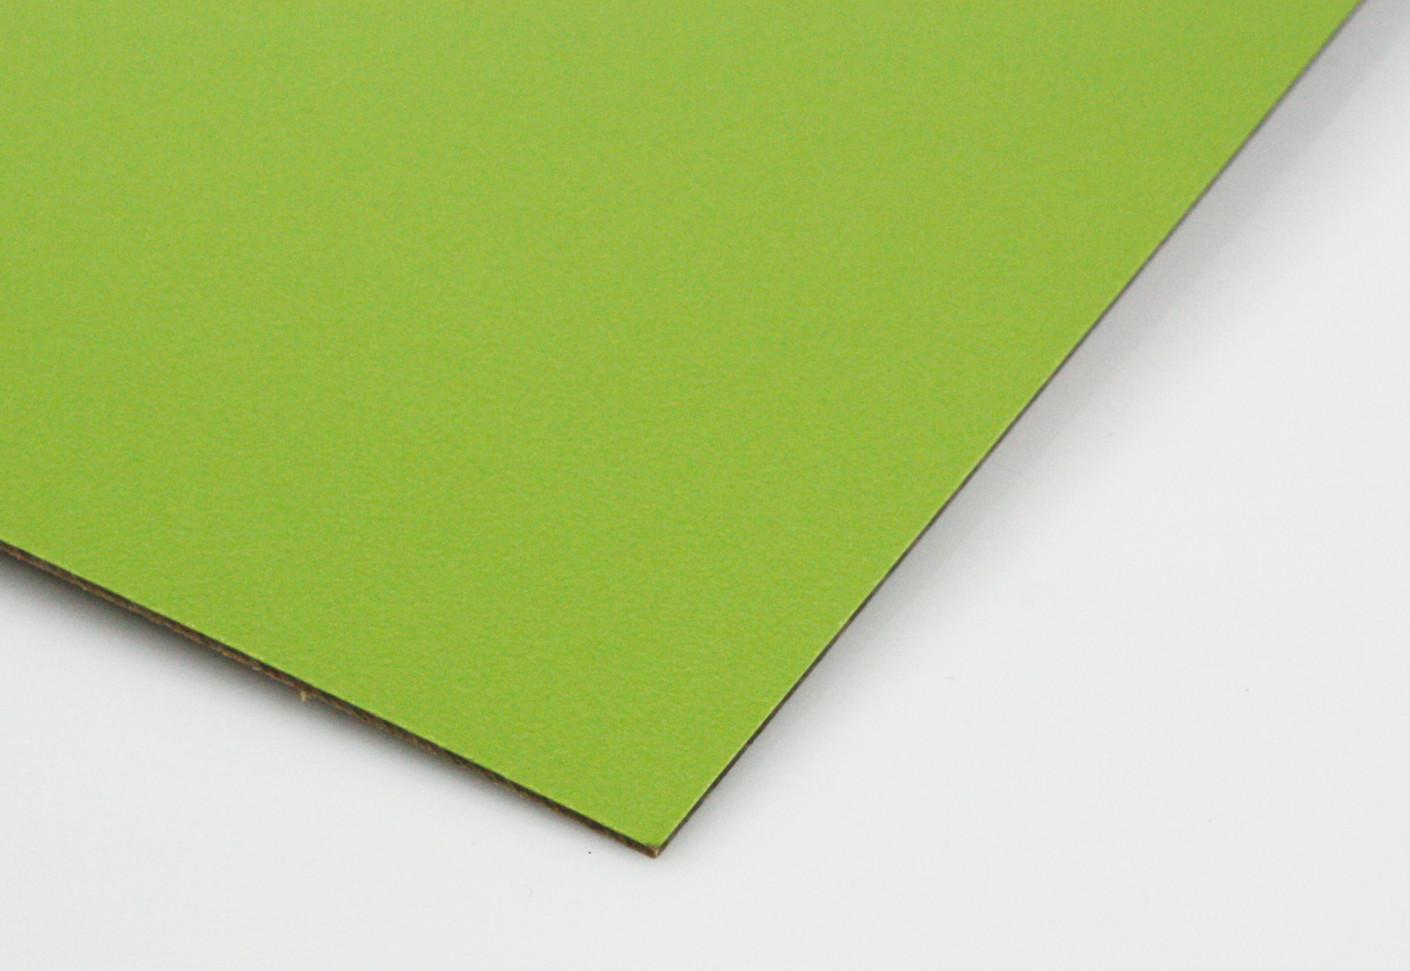 resopal platte plain colours von resopal stylepark. Black Bedroom Furniture Sets. Home Design Ideas